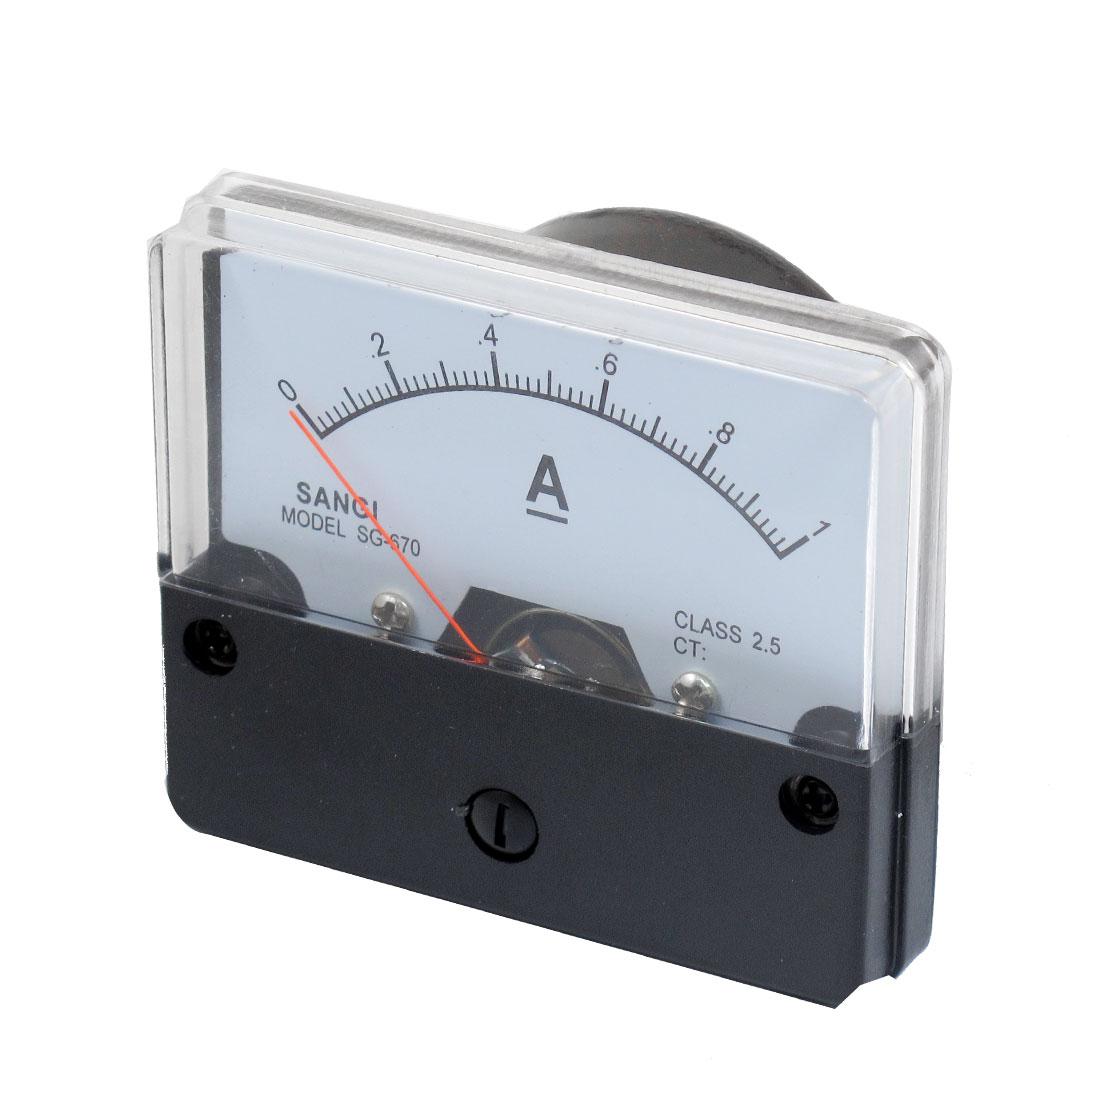 DC 0-1A Rectangle Analog Panel Thread Mount Ammeter Gauge